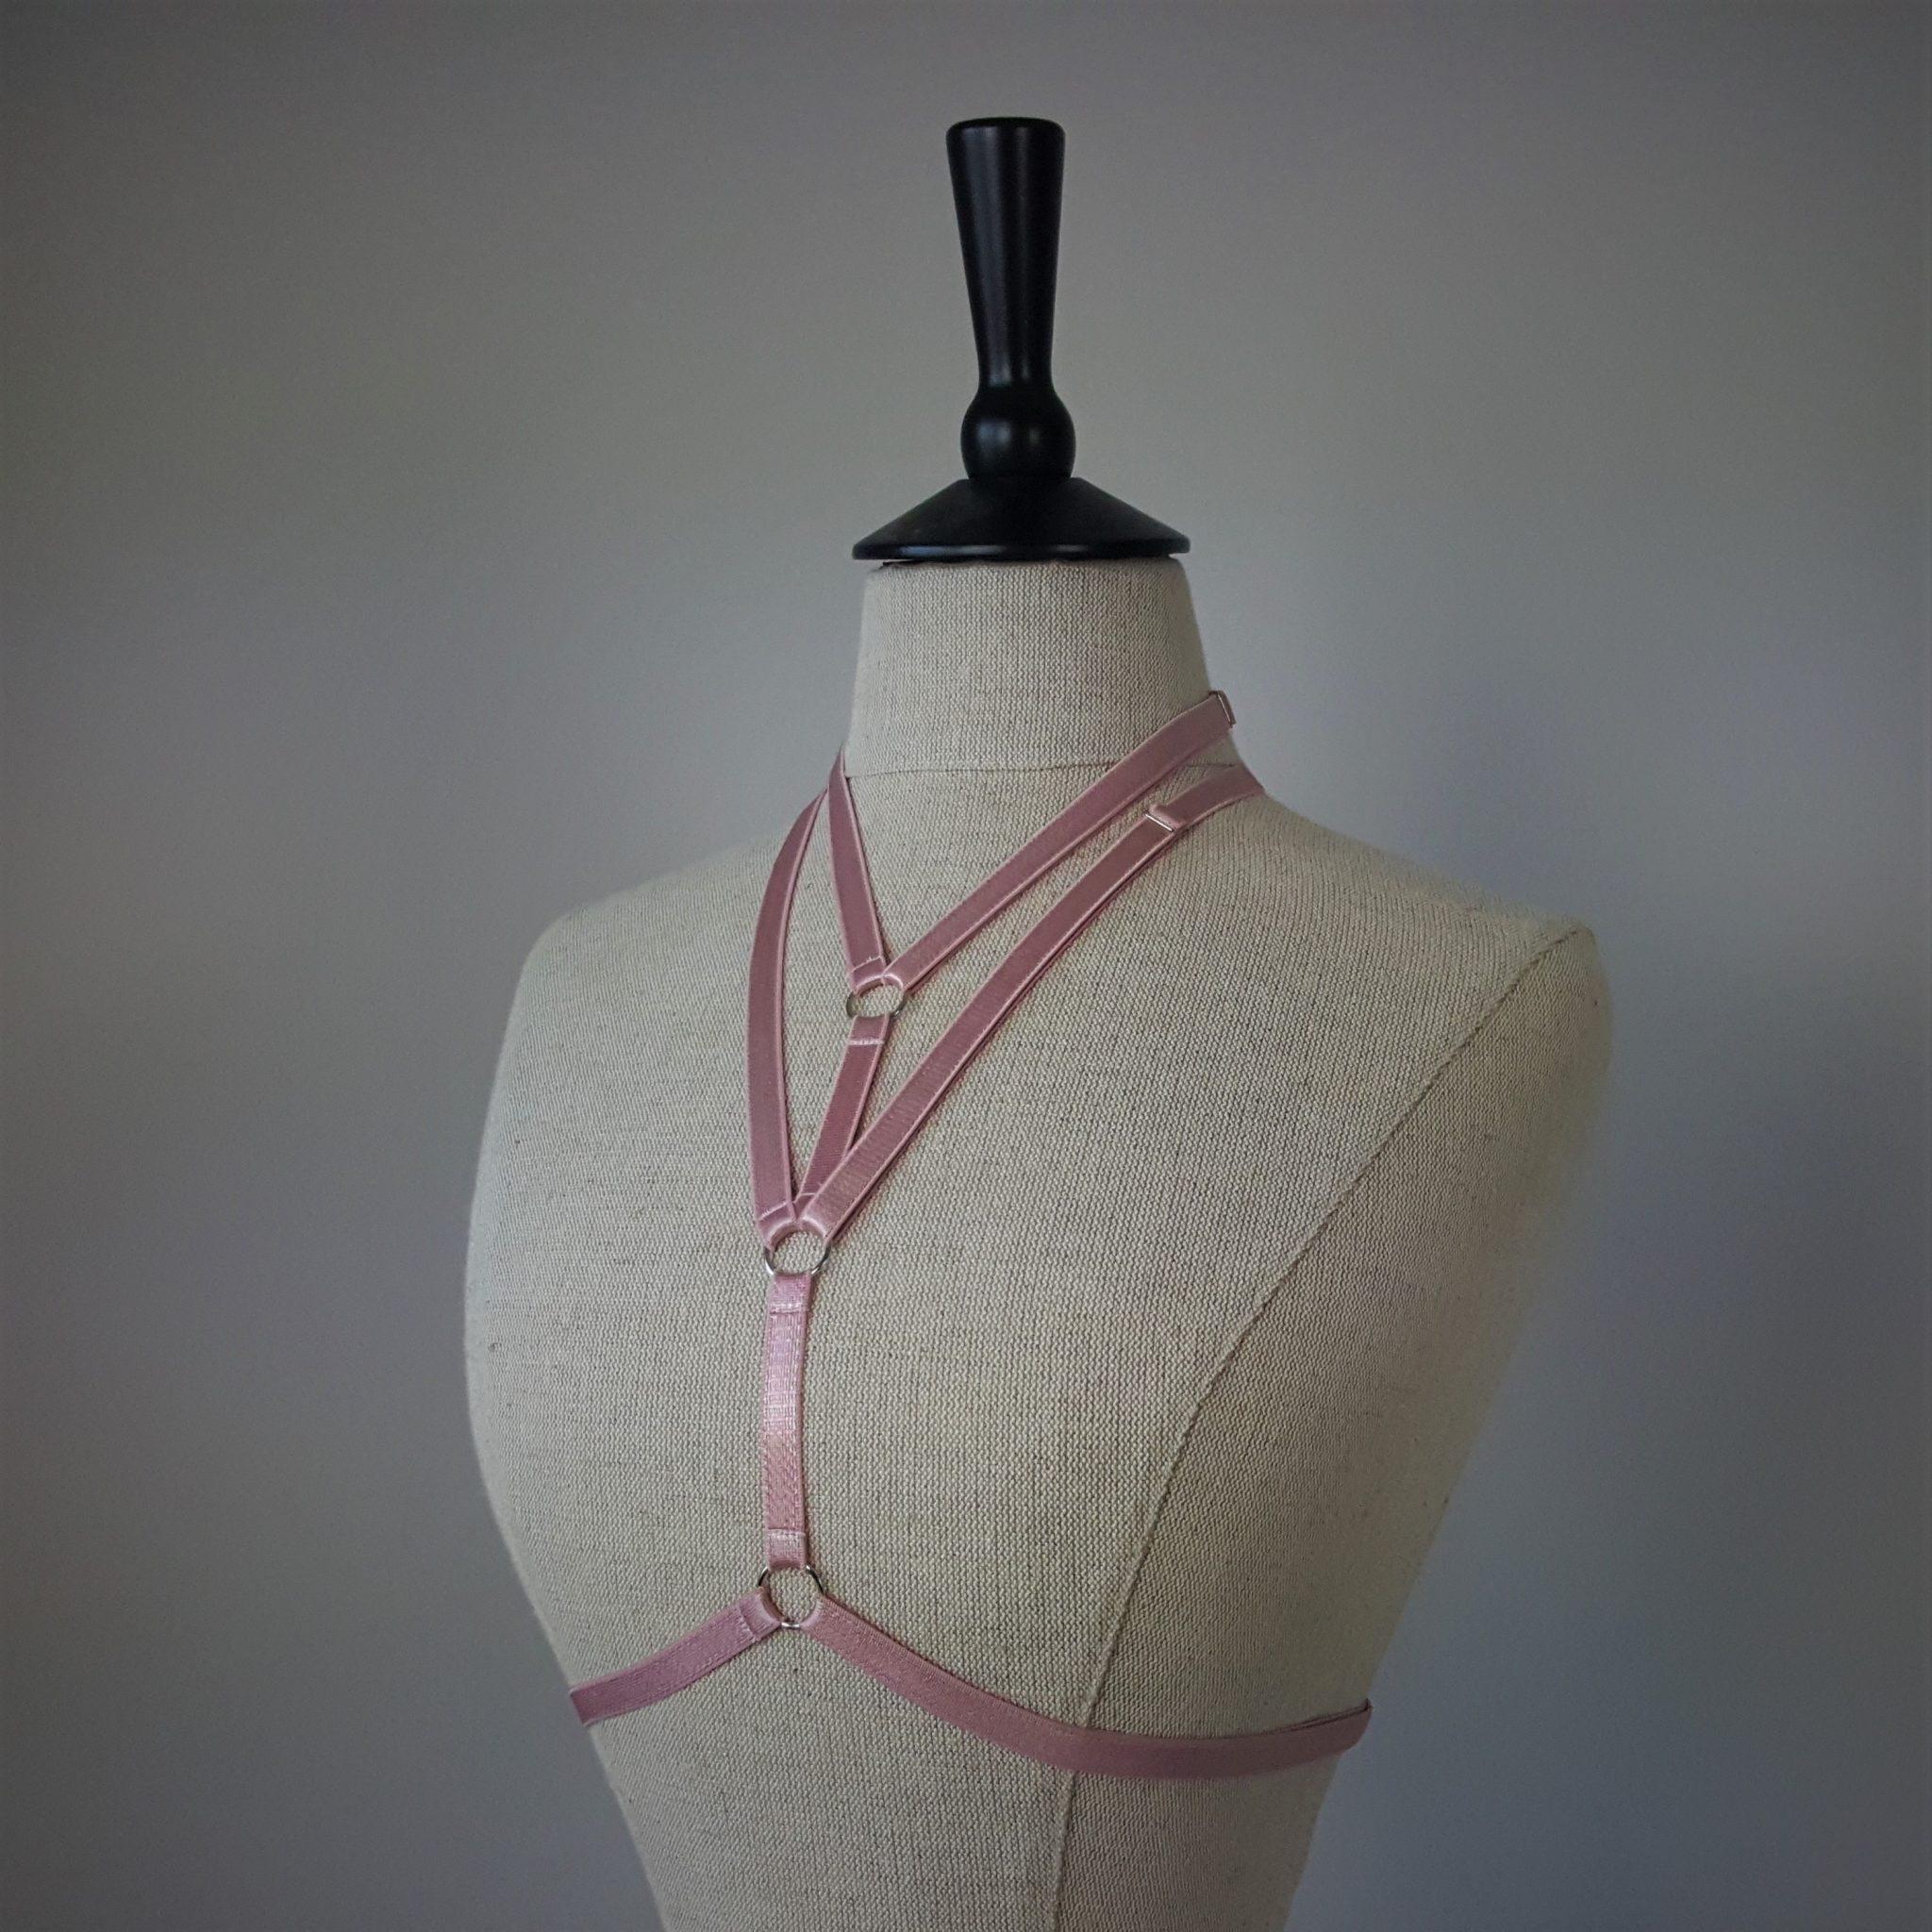 Dusky pink regate harness